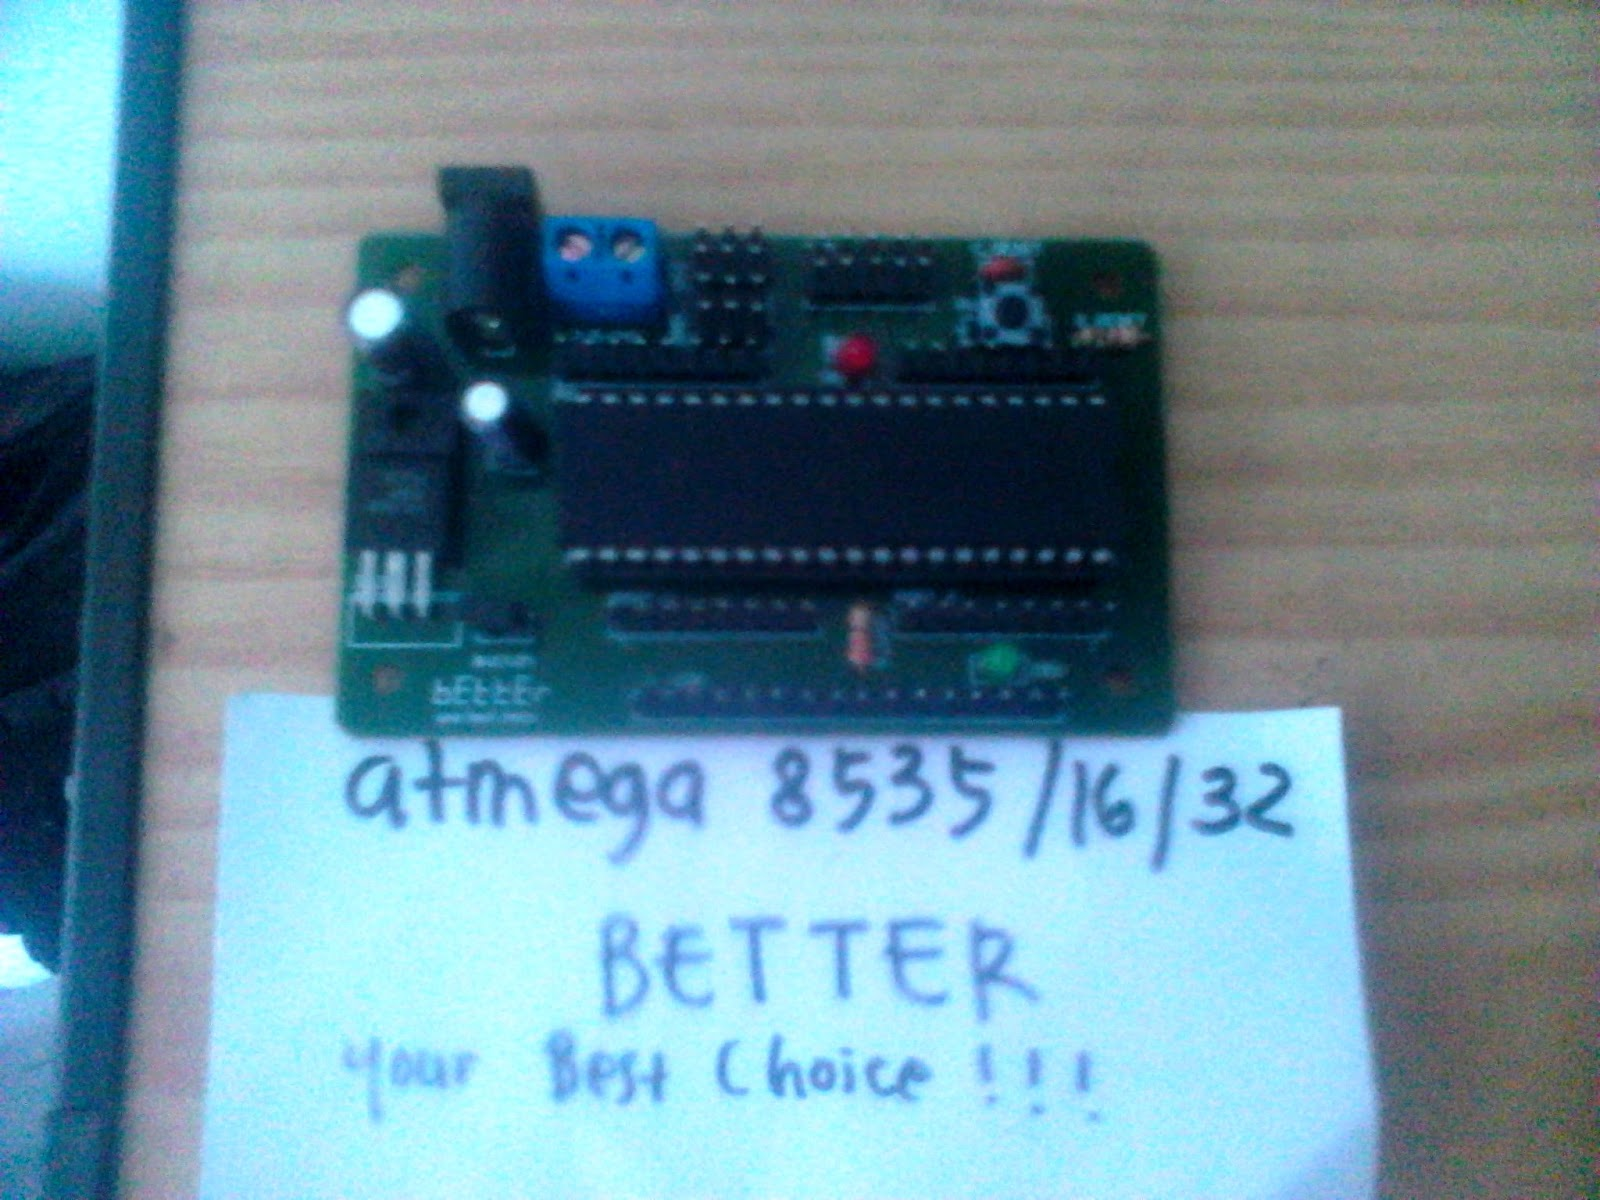 Better Bika Electronic Center November 2010 Electrocircuit Schema Datasheet Indicator Power Dan Isp Downloader